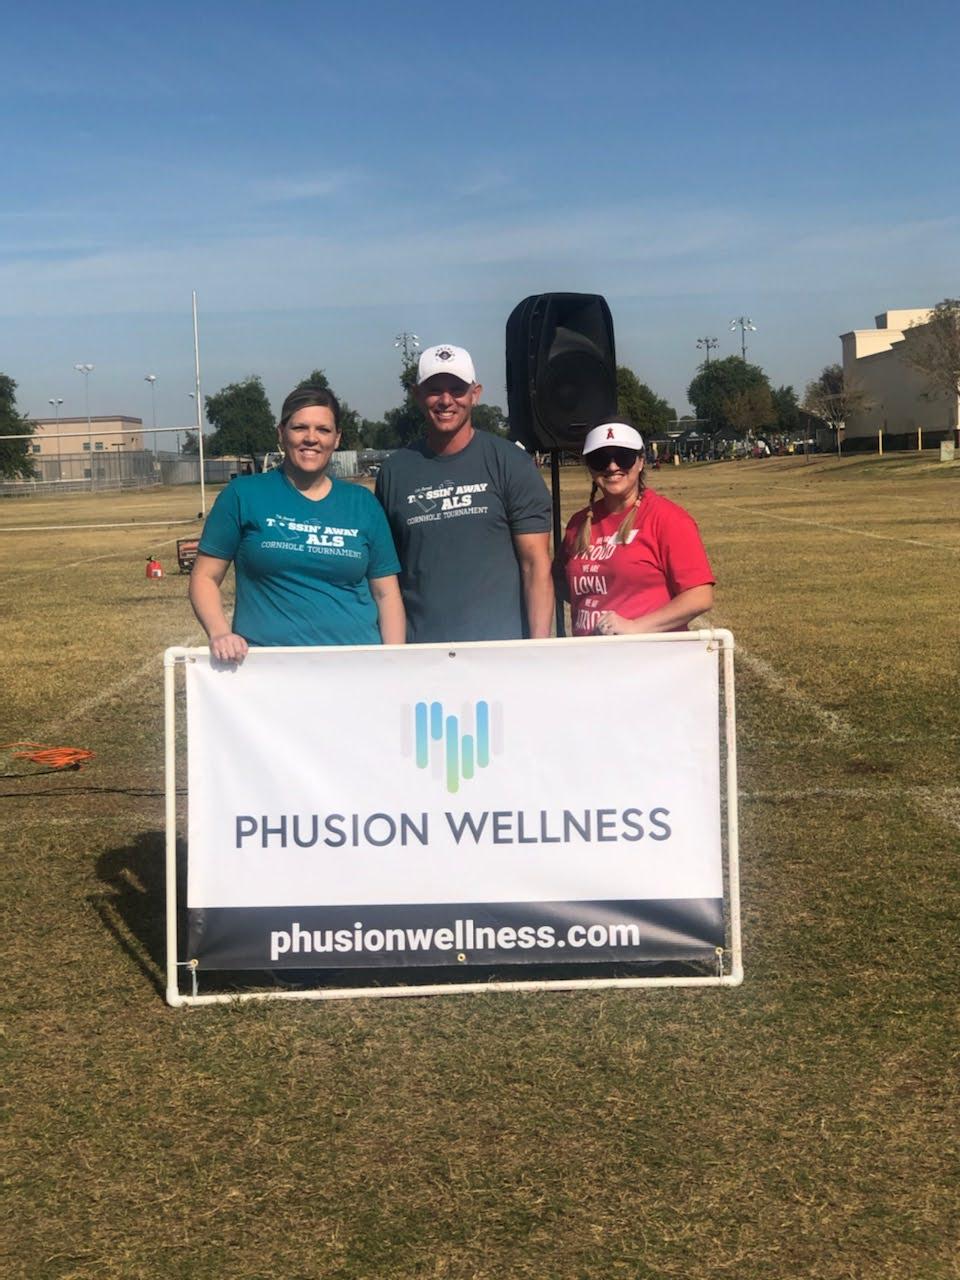 Phusion Wellness team standing infront of Phusion Wellness banner